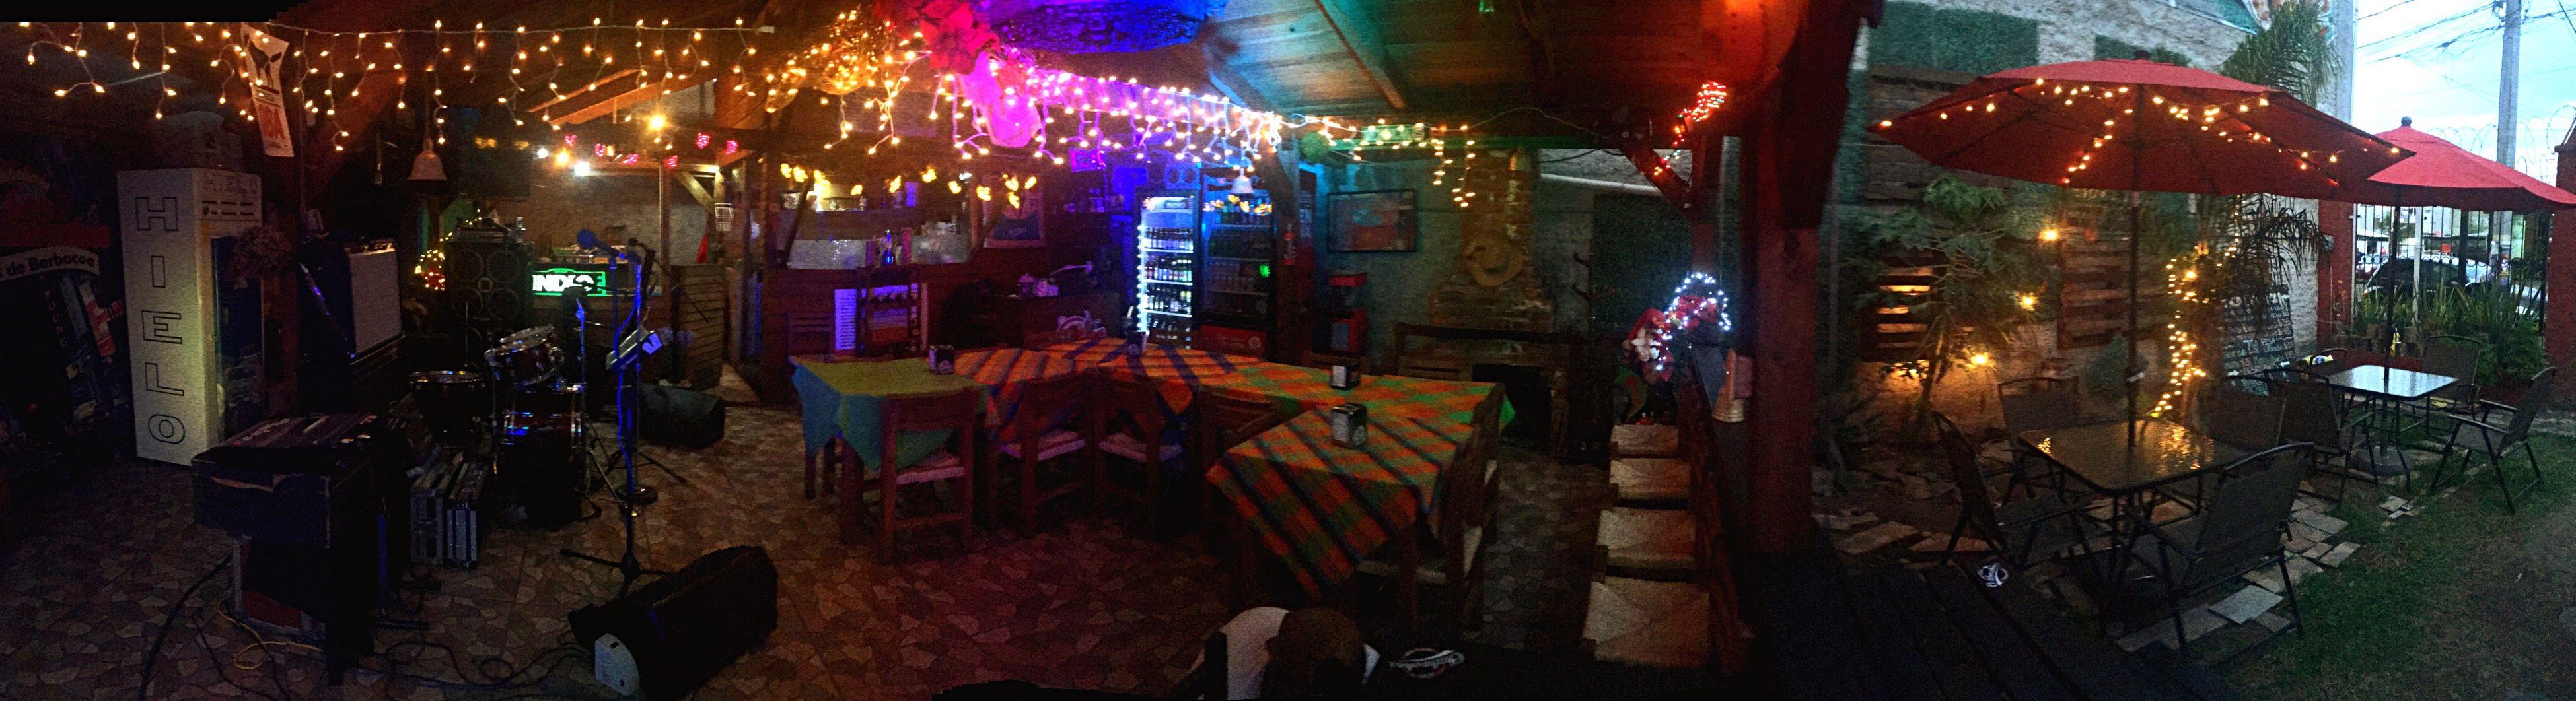 illuminated, night, lighting equipment, neon, indoors, multi colored, nightlife, no people, architecture